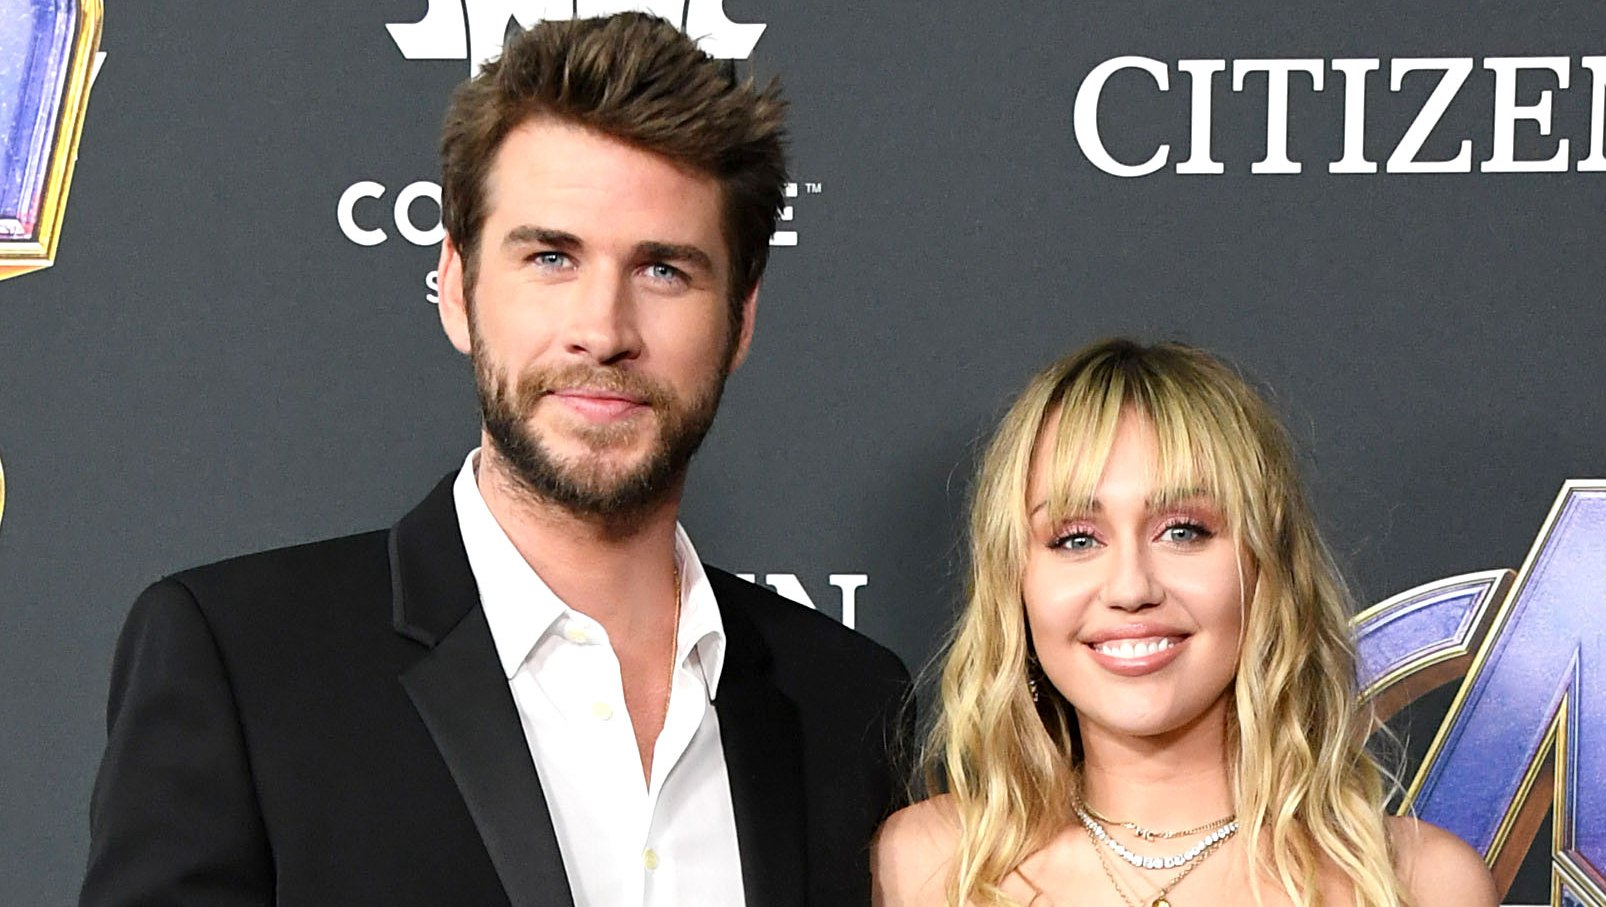 MileyCyrus Thinks Liam Hemsworth Is Good To Eat